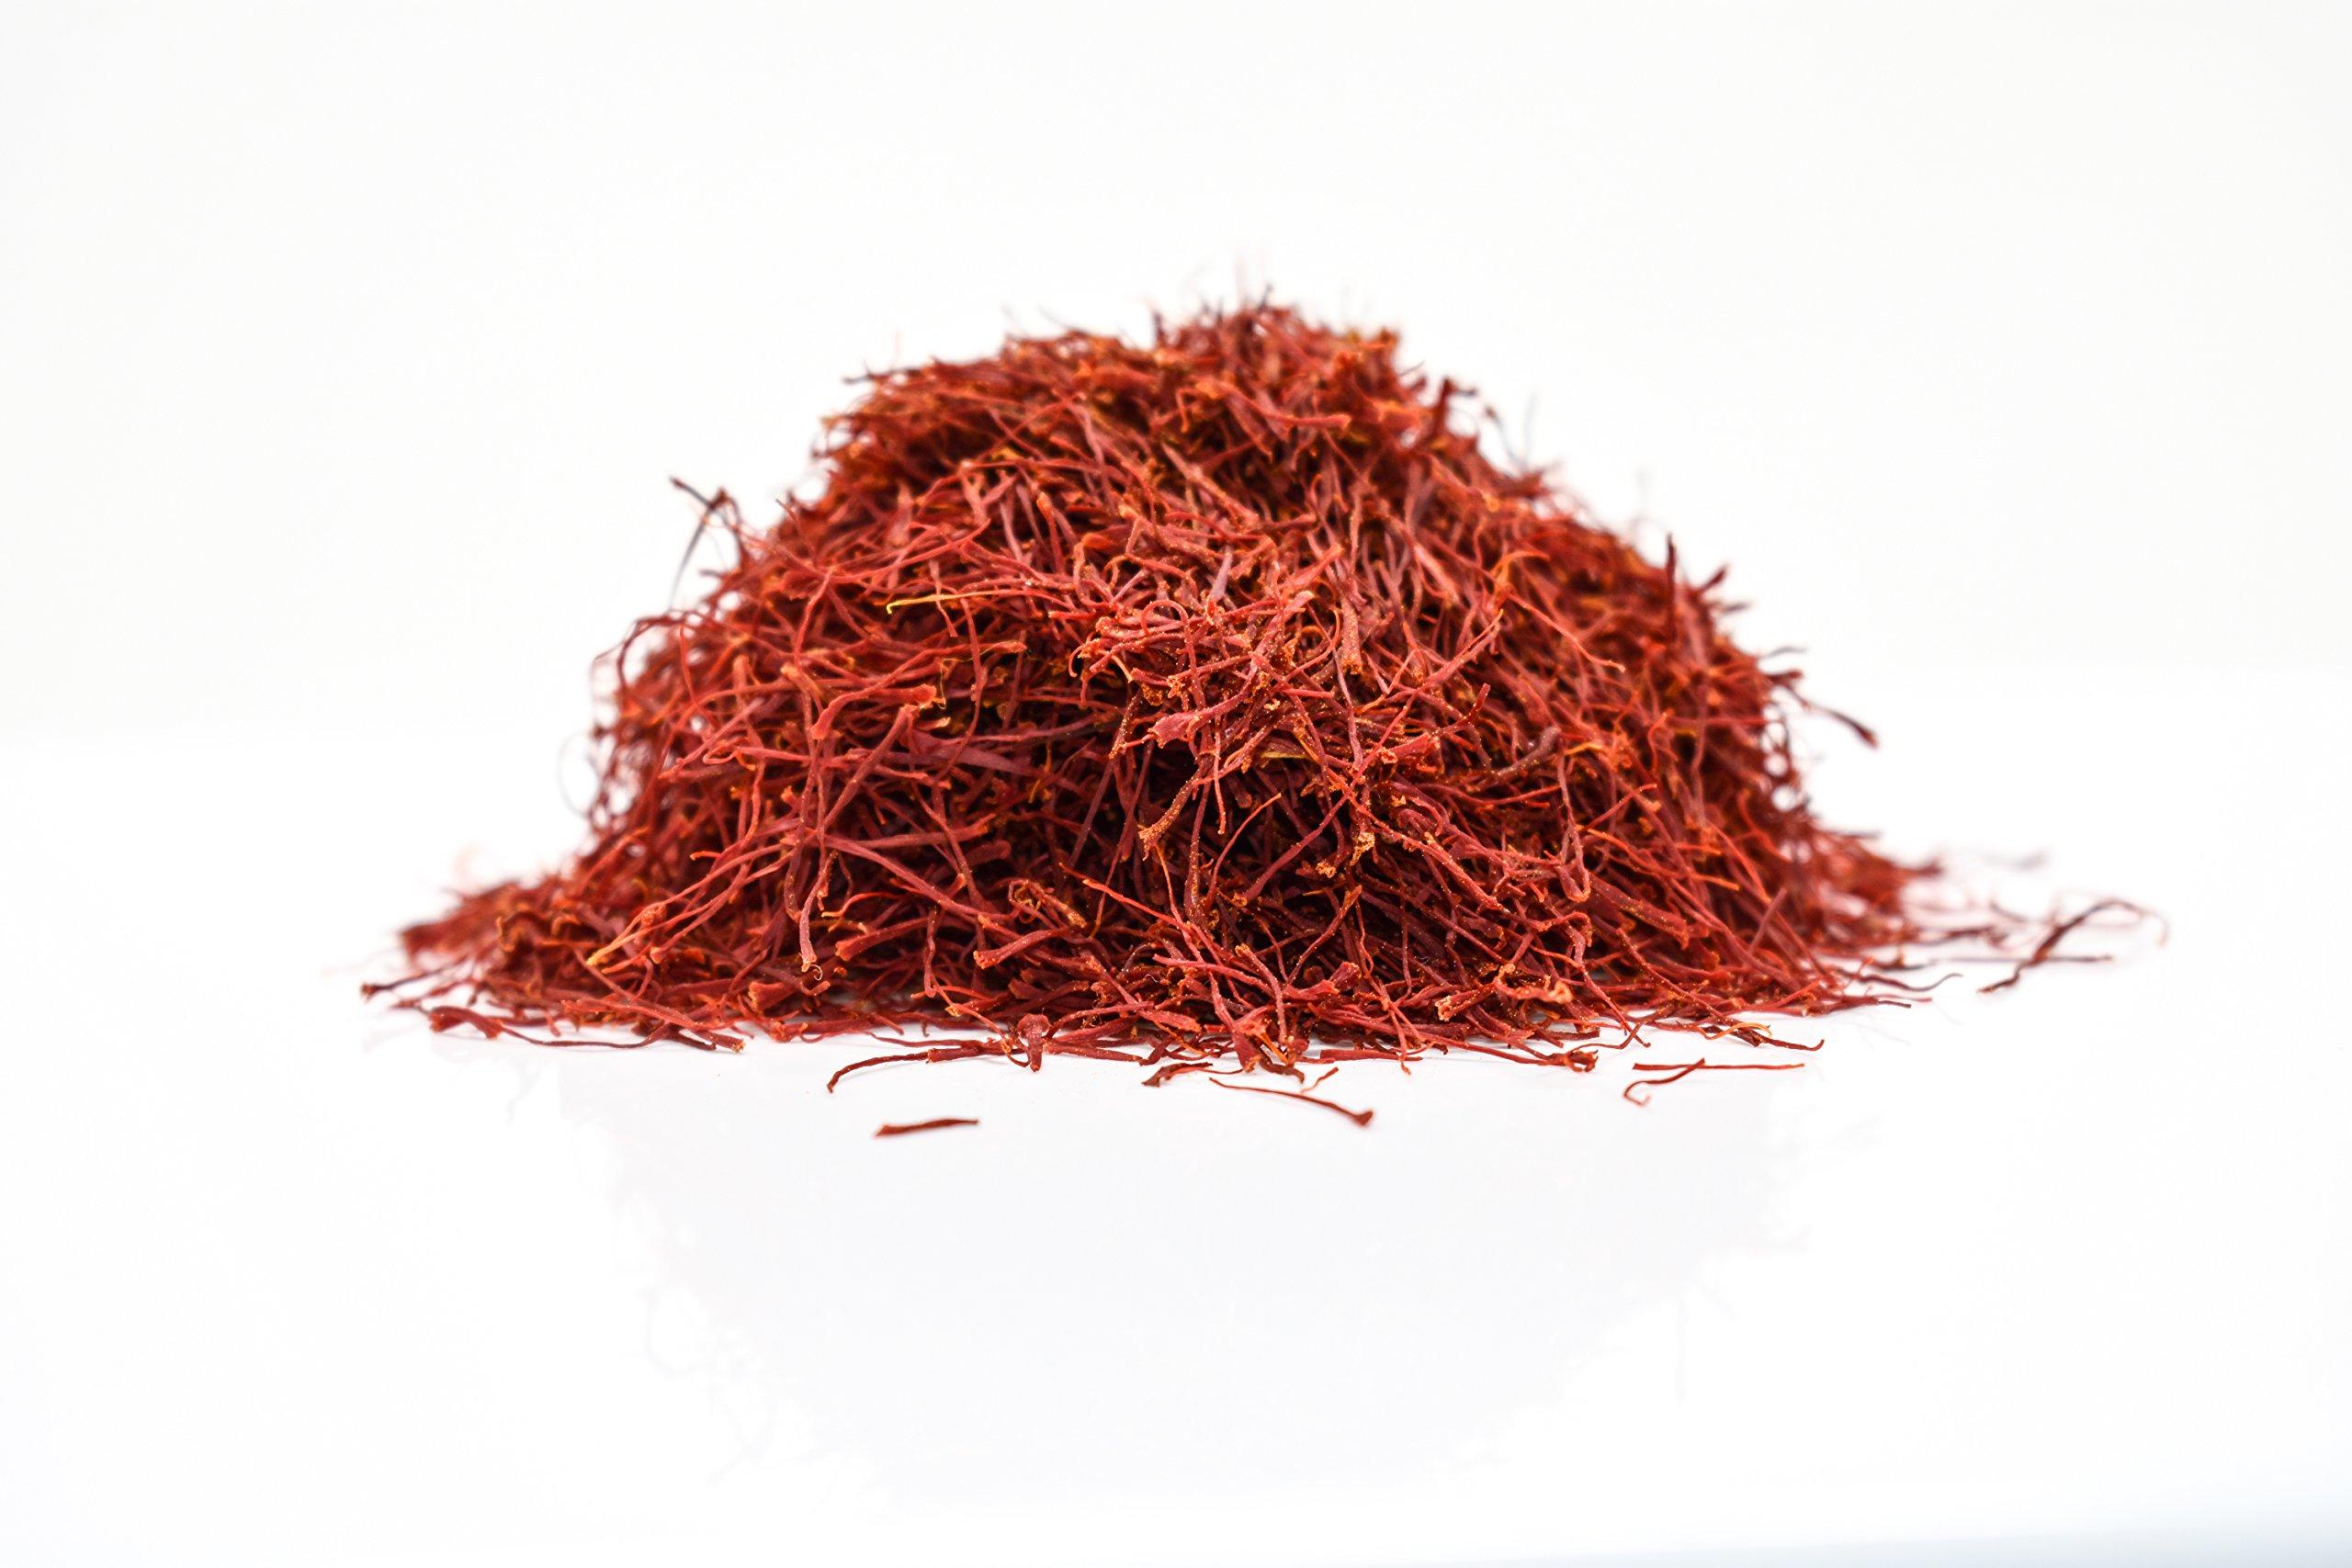 Persian Saffron Threads by Slofoodgroup Premium Quality Saffron Threads, All Red Saffron Filaments (various sizes) Grade I Saffron ( .25 Ounce Saffron) by Slofoodgroup (Image #8)